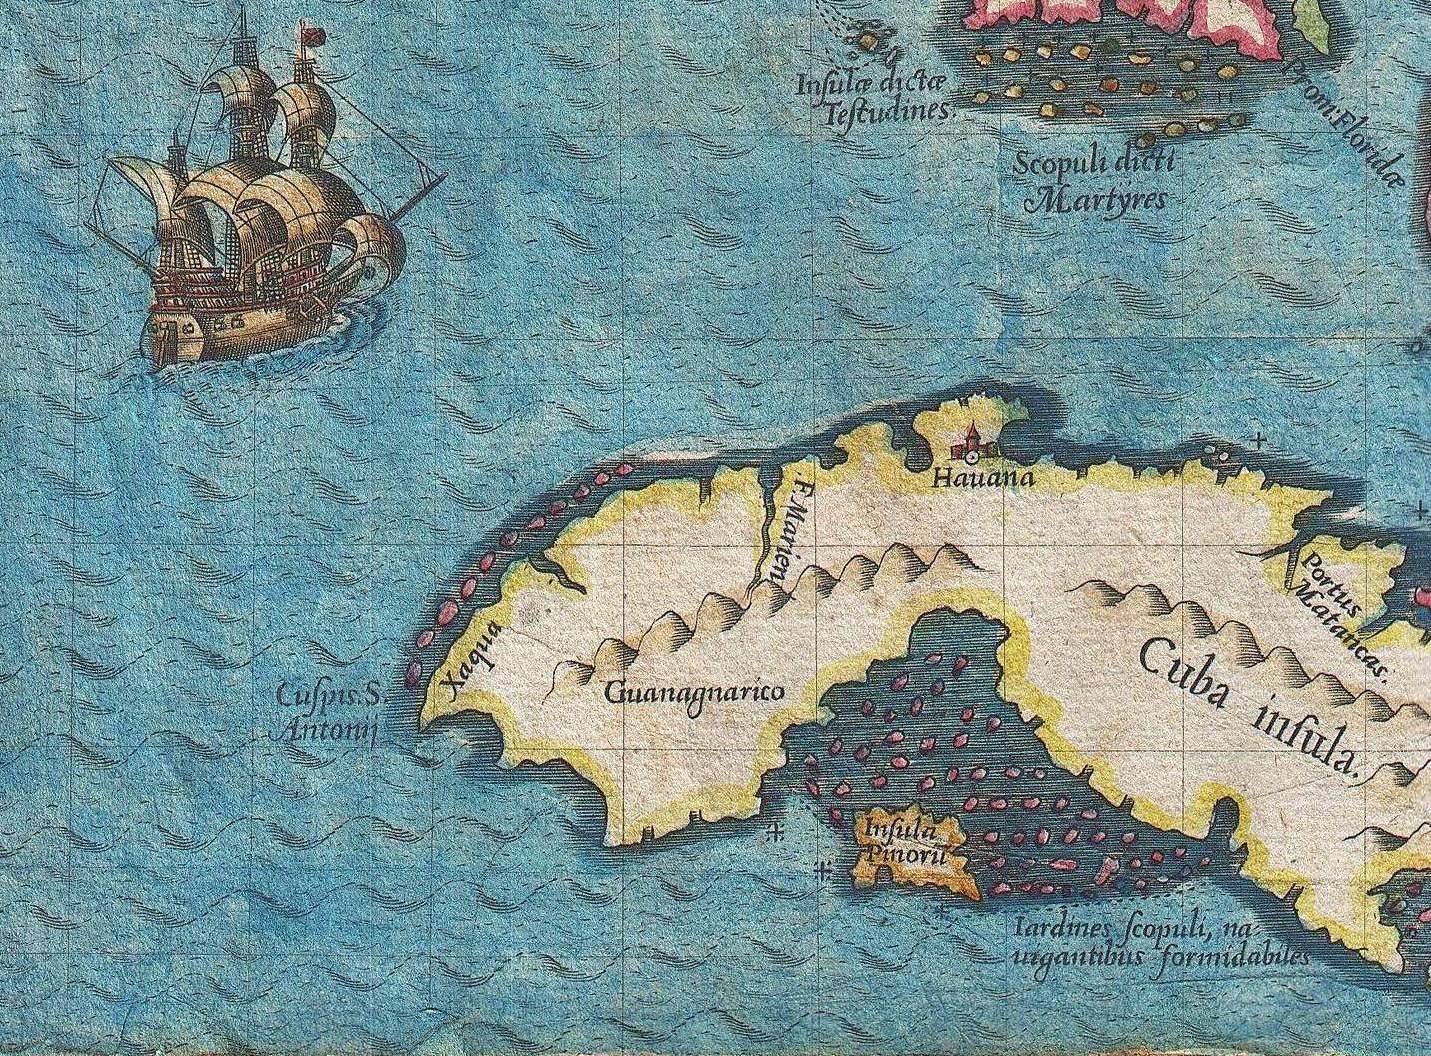 Florida To Cuba Map.File 1591 De Bry And Le Moyne Map Of Florida And Cuba 1591 Jpg